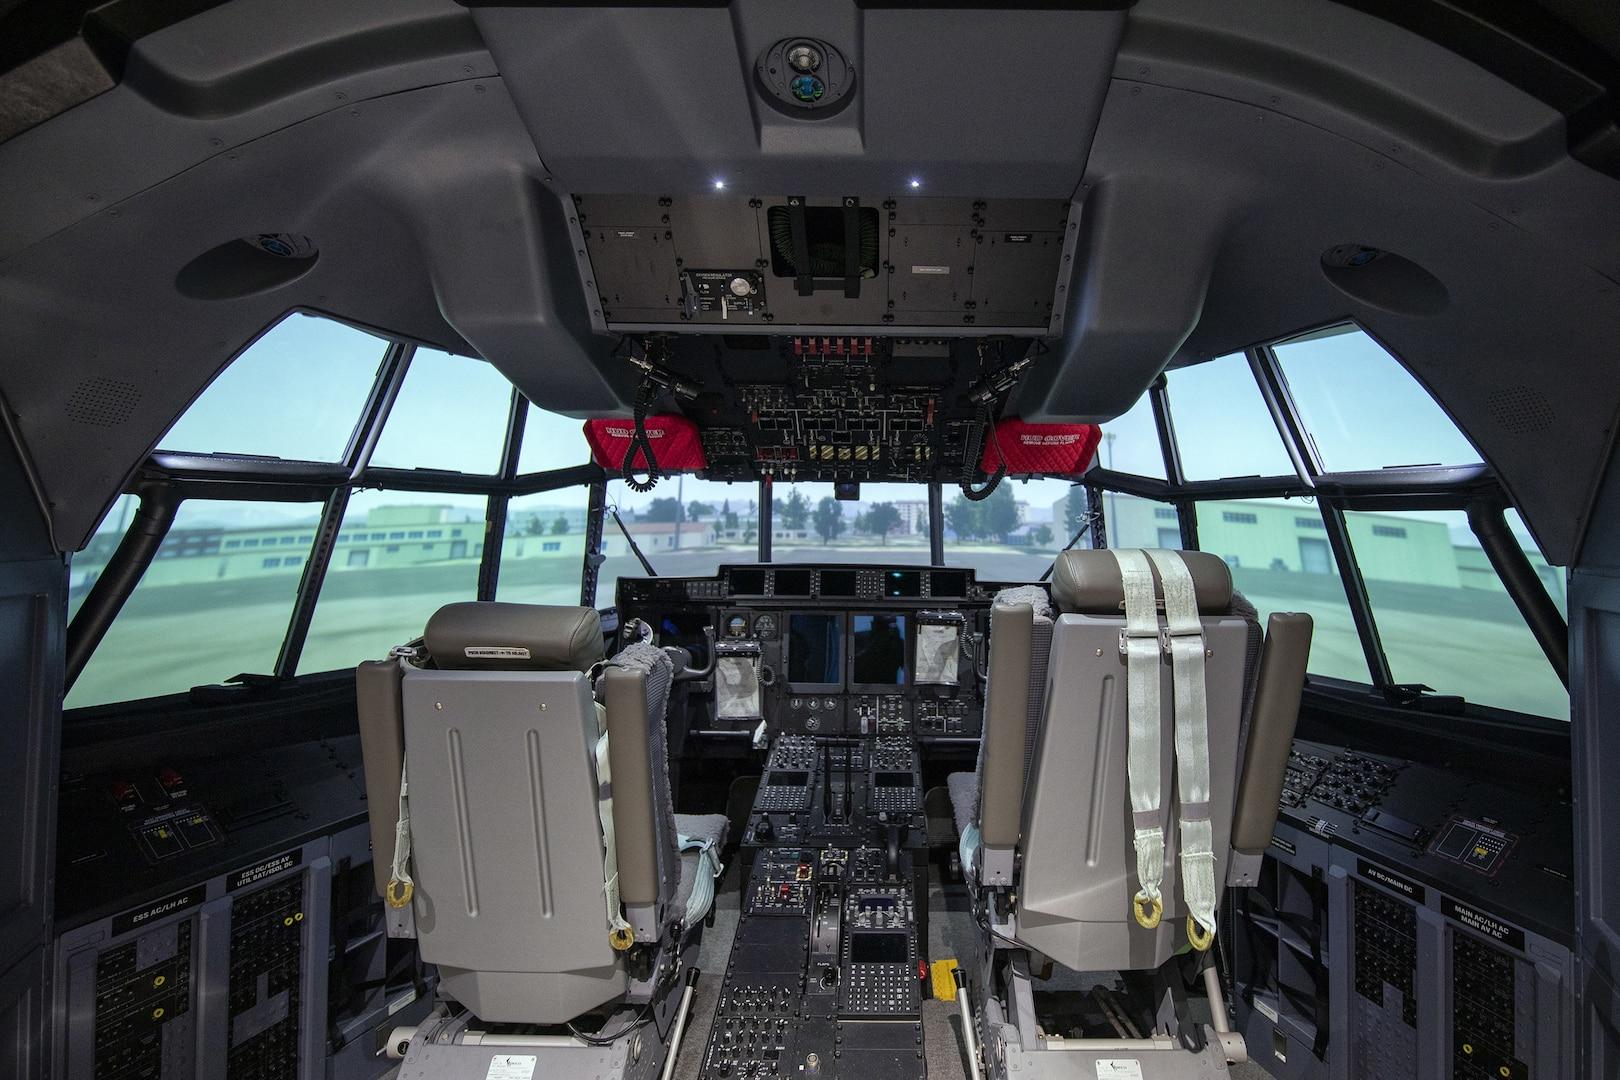 Yokota receives a C-130J Weapons System Training simulator